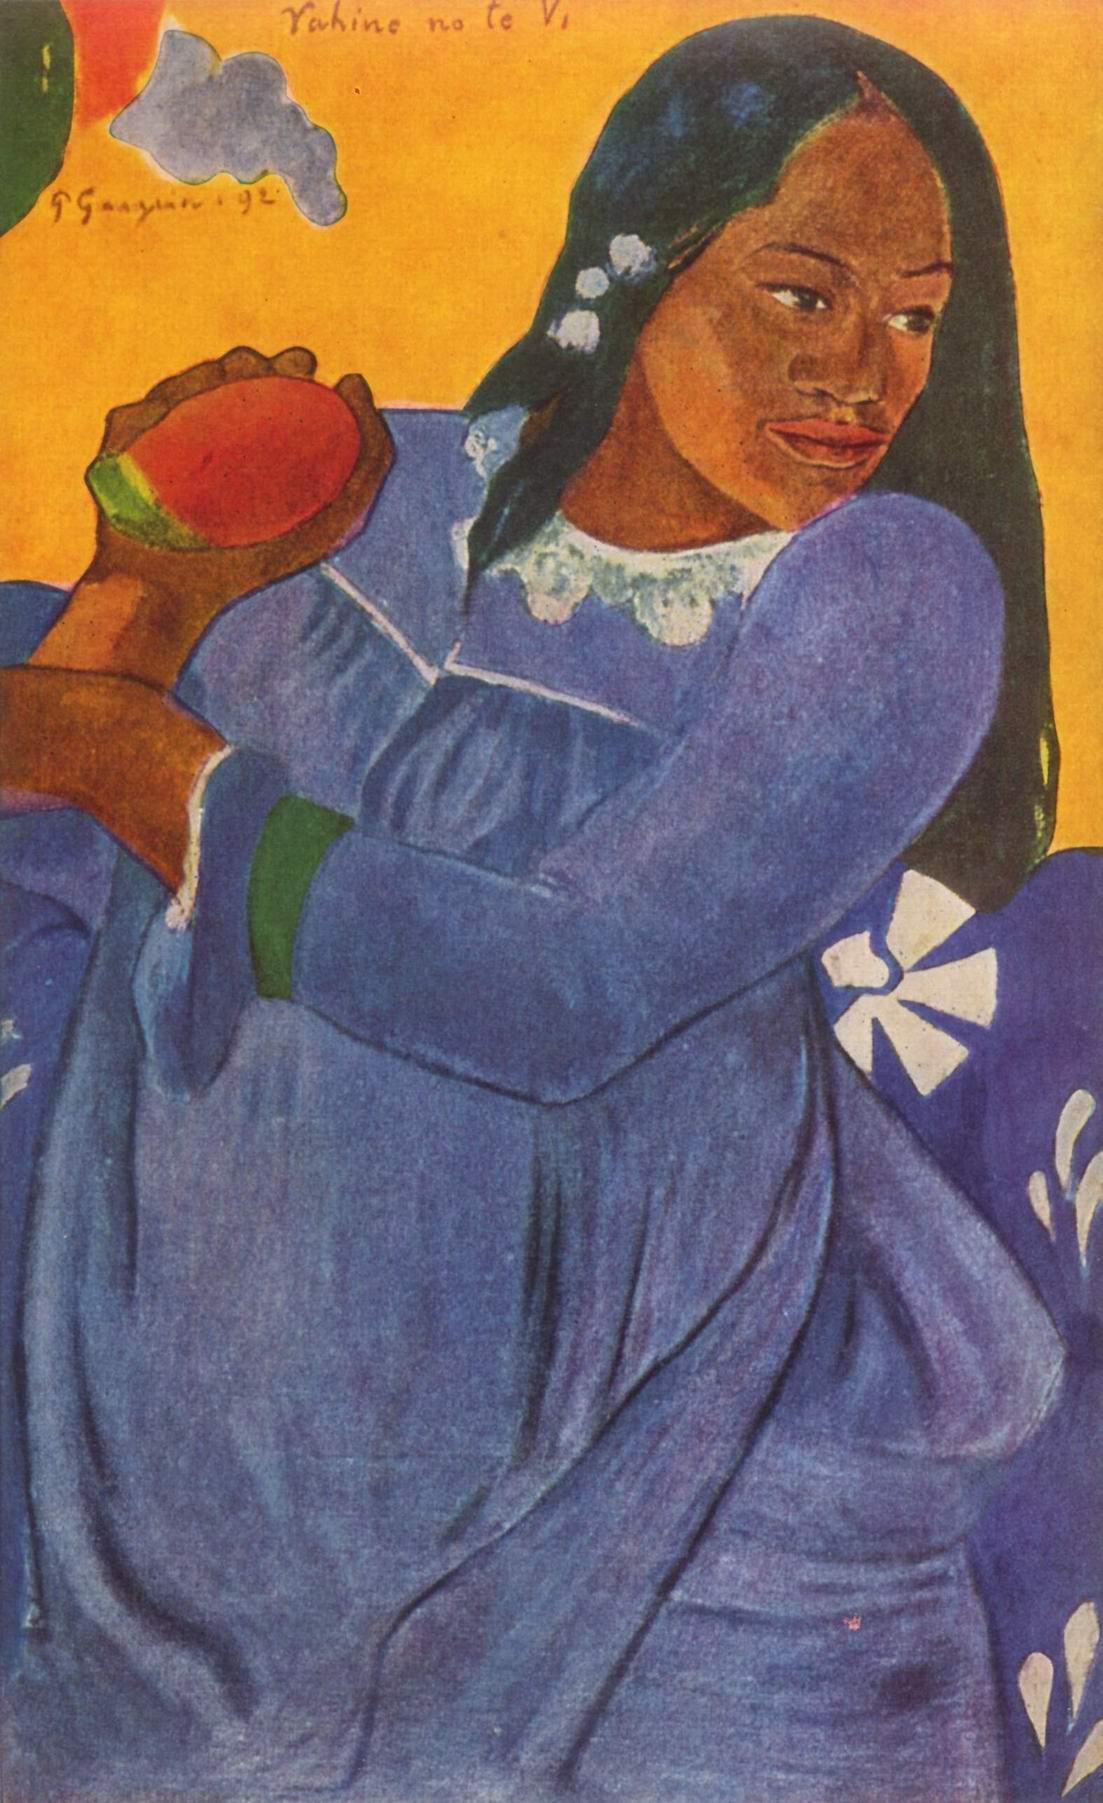 Таитянка с плодами манго, Поль Гоген